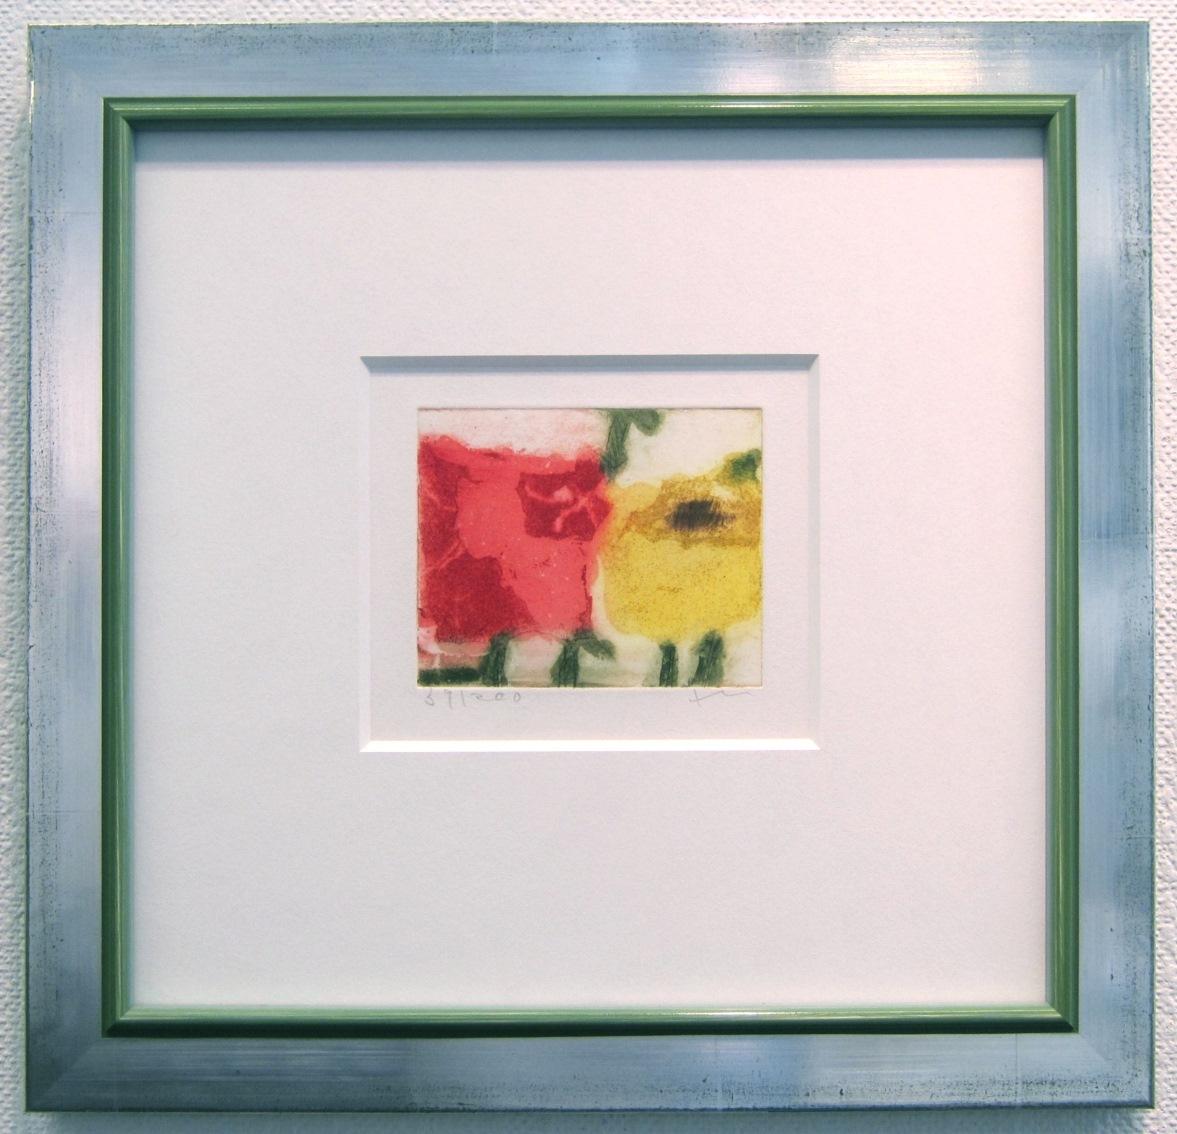 Rosen rot/gelb, gerahmt silber